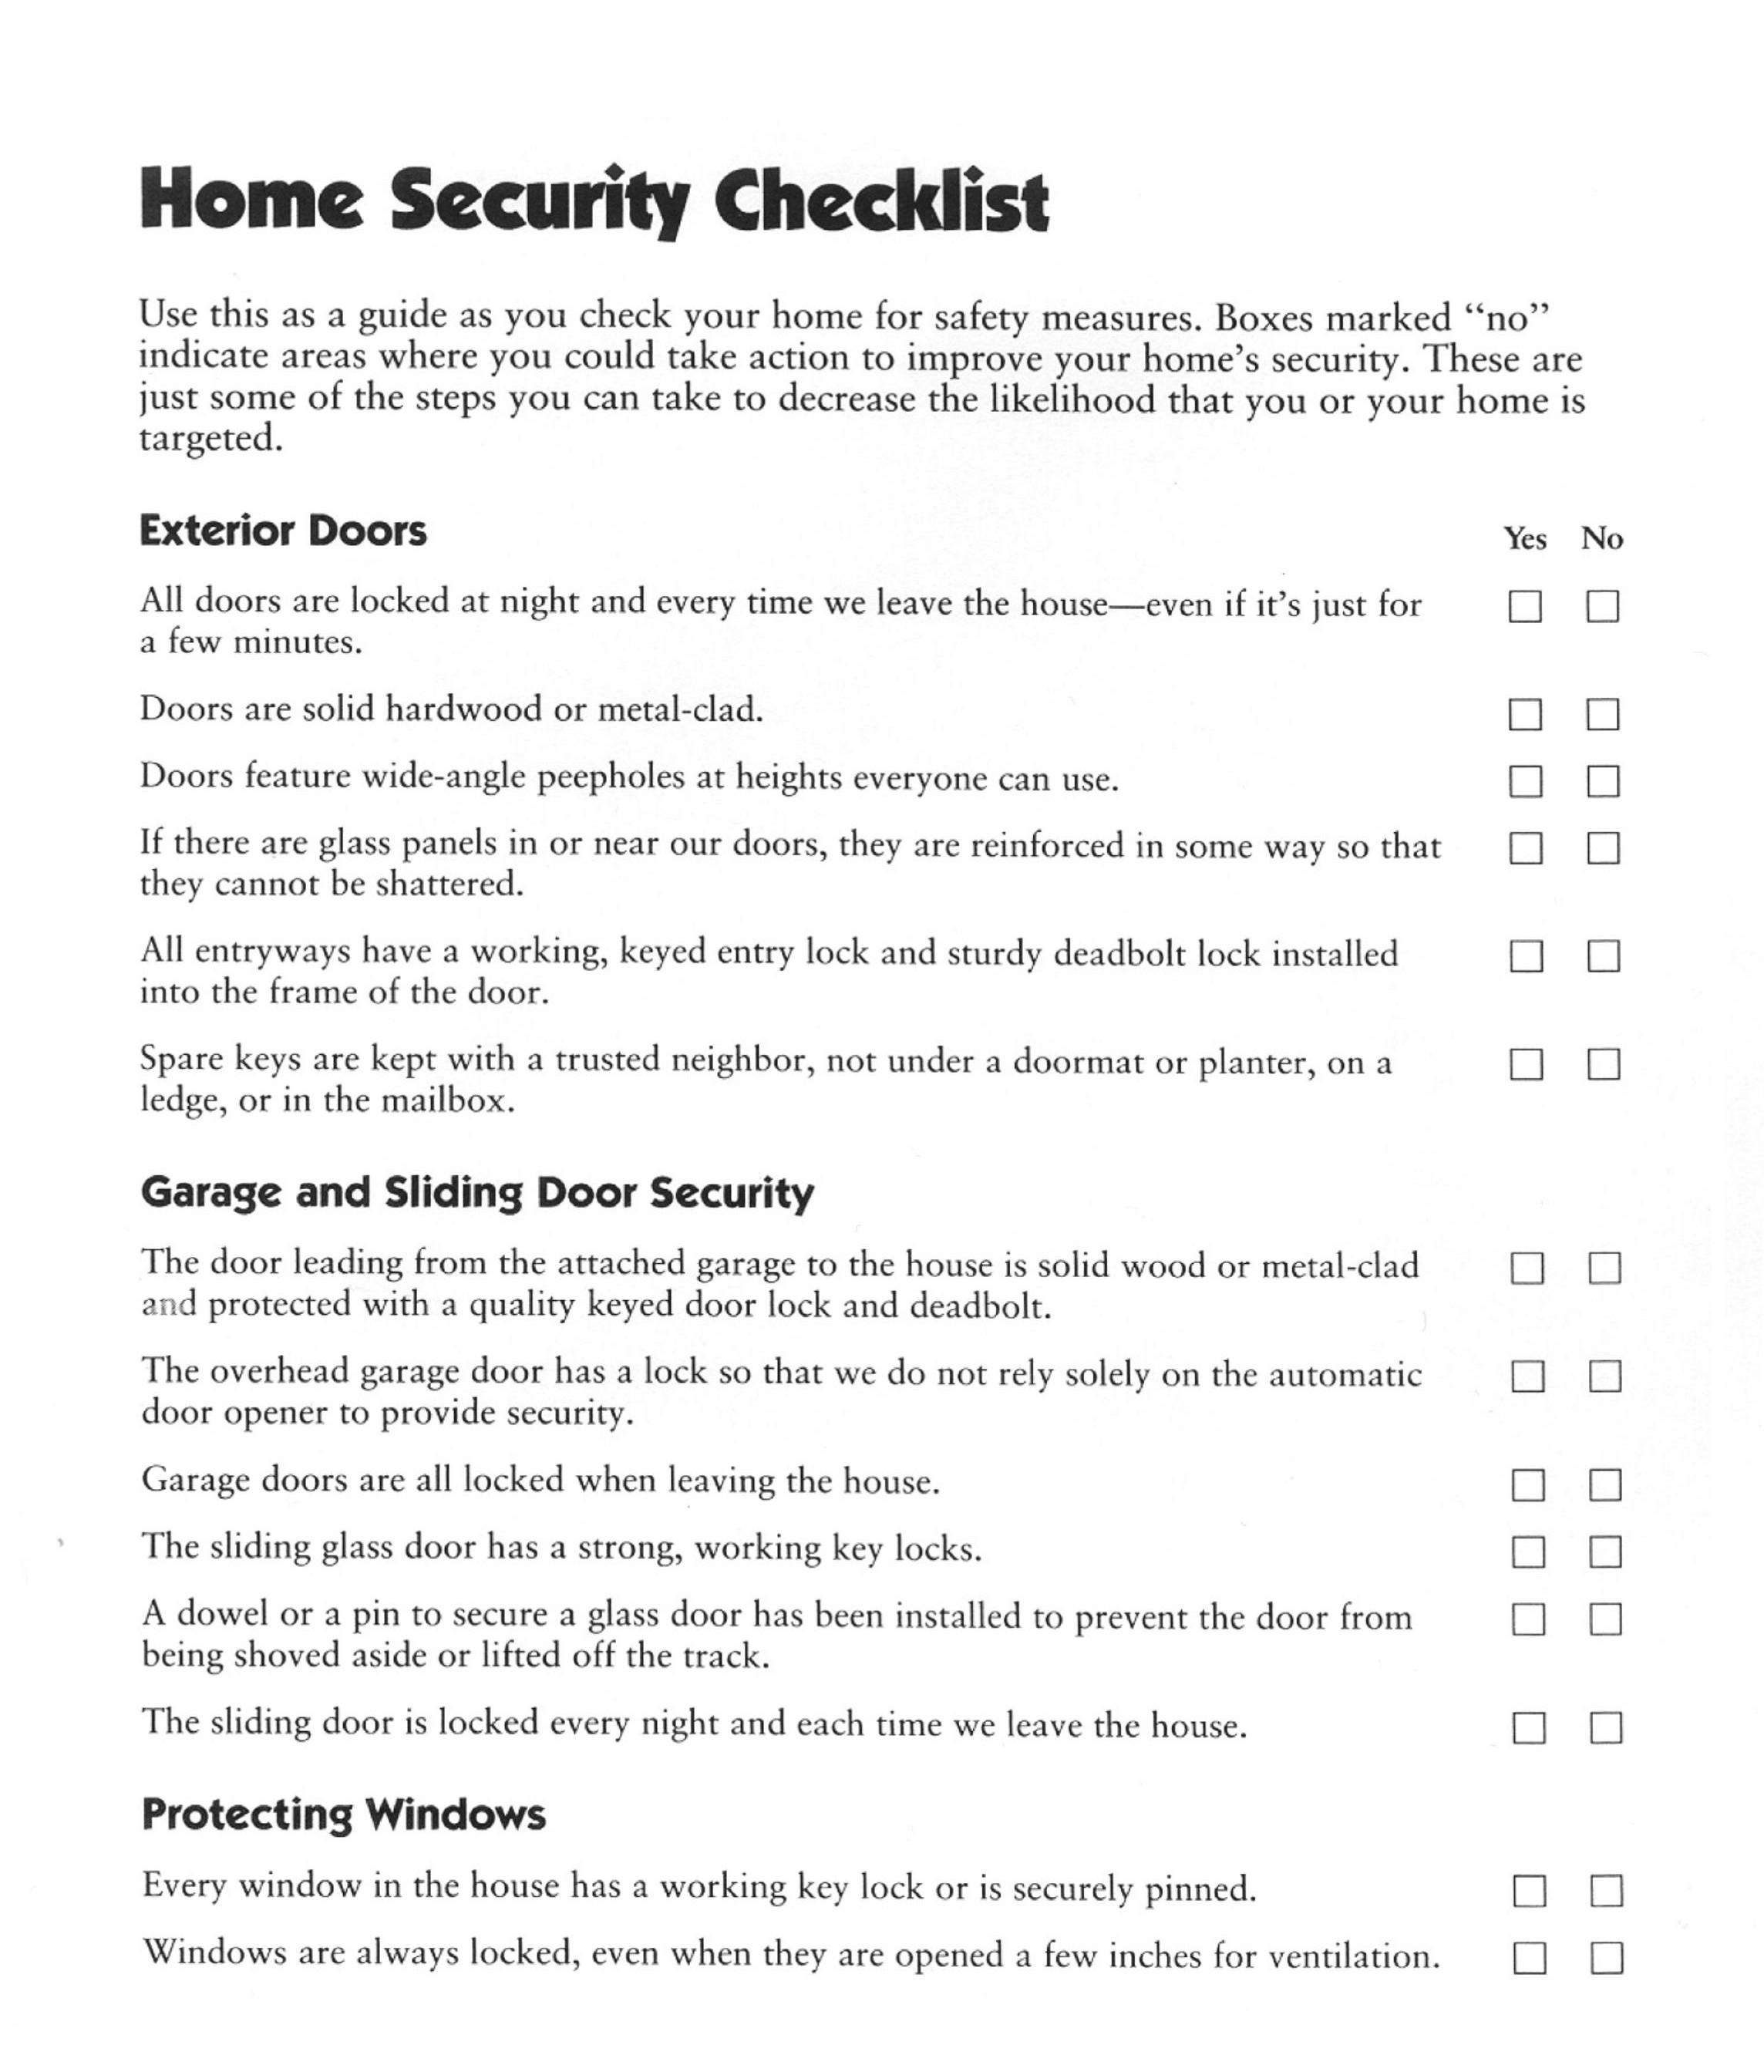 Home Security Checklist (1).jpg